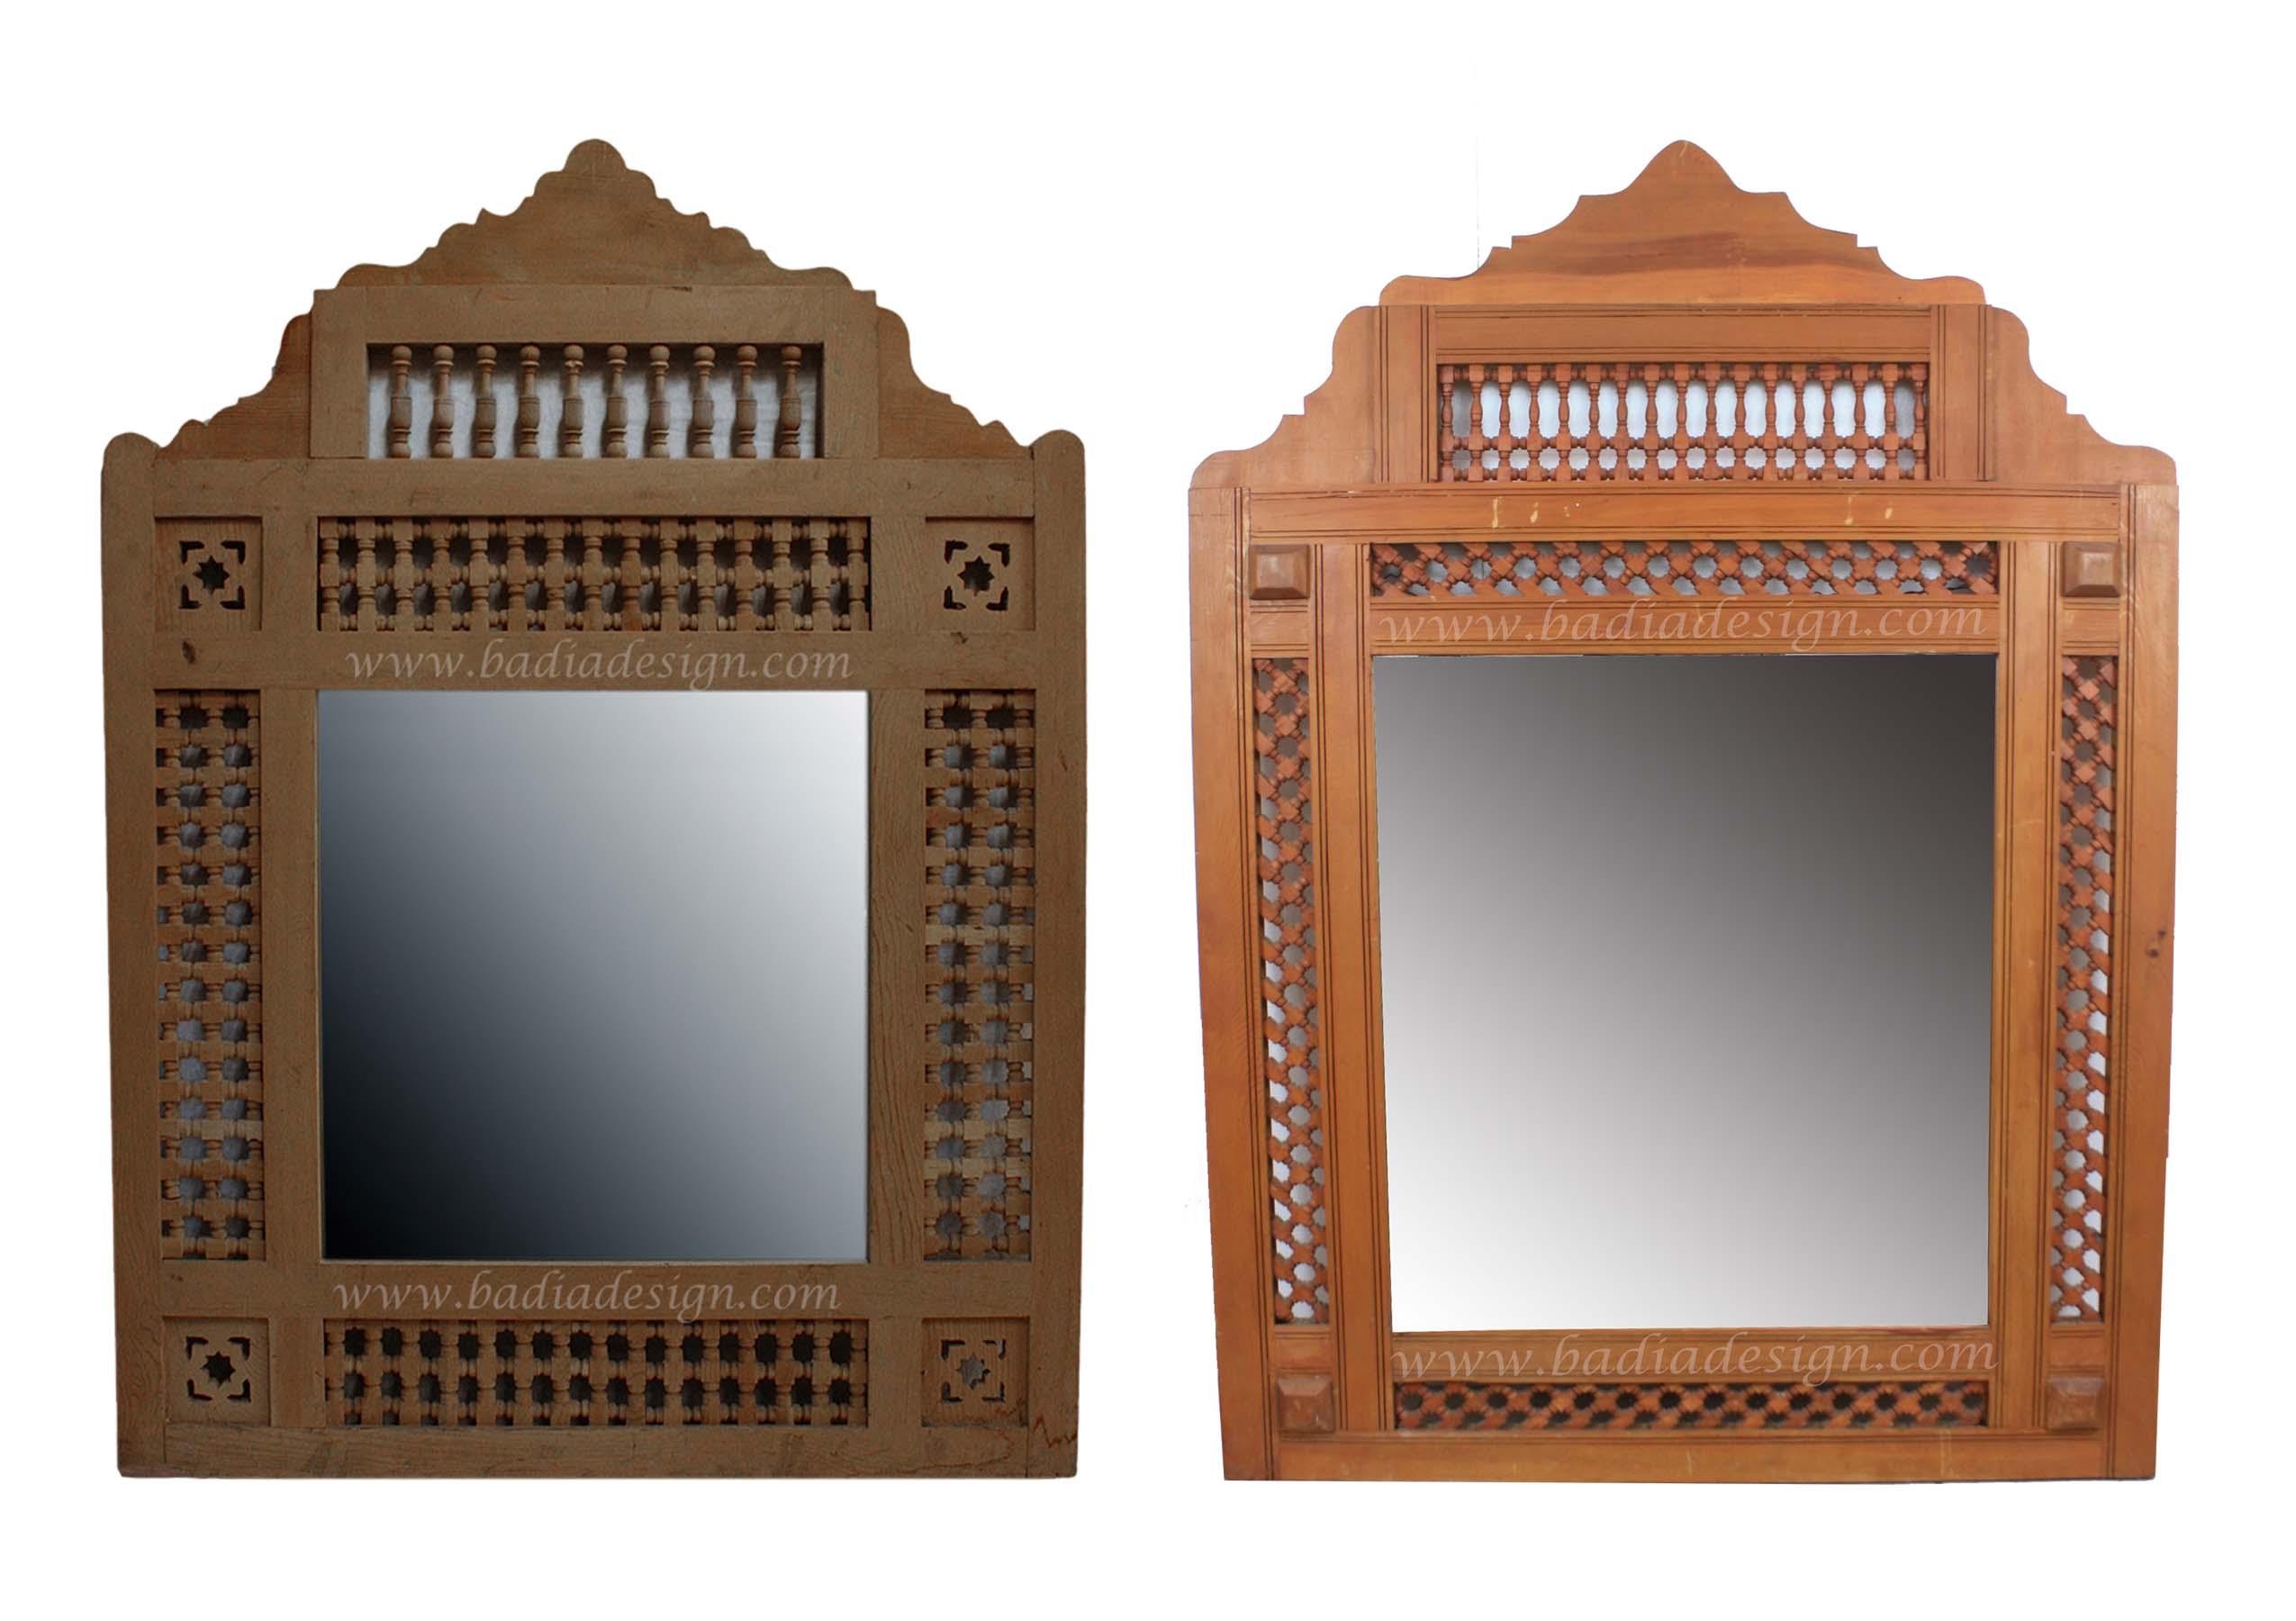 moroccan-moucharabieh-wooden-mirror-m-w001.jpg